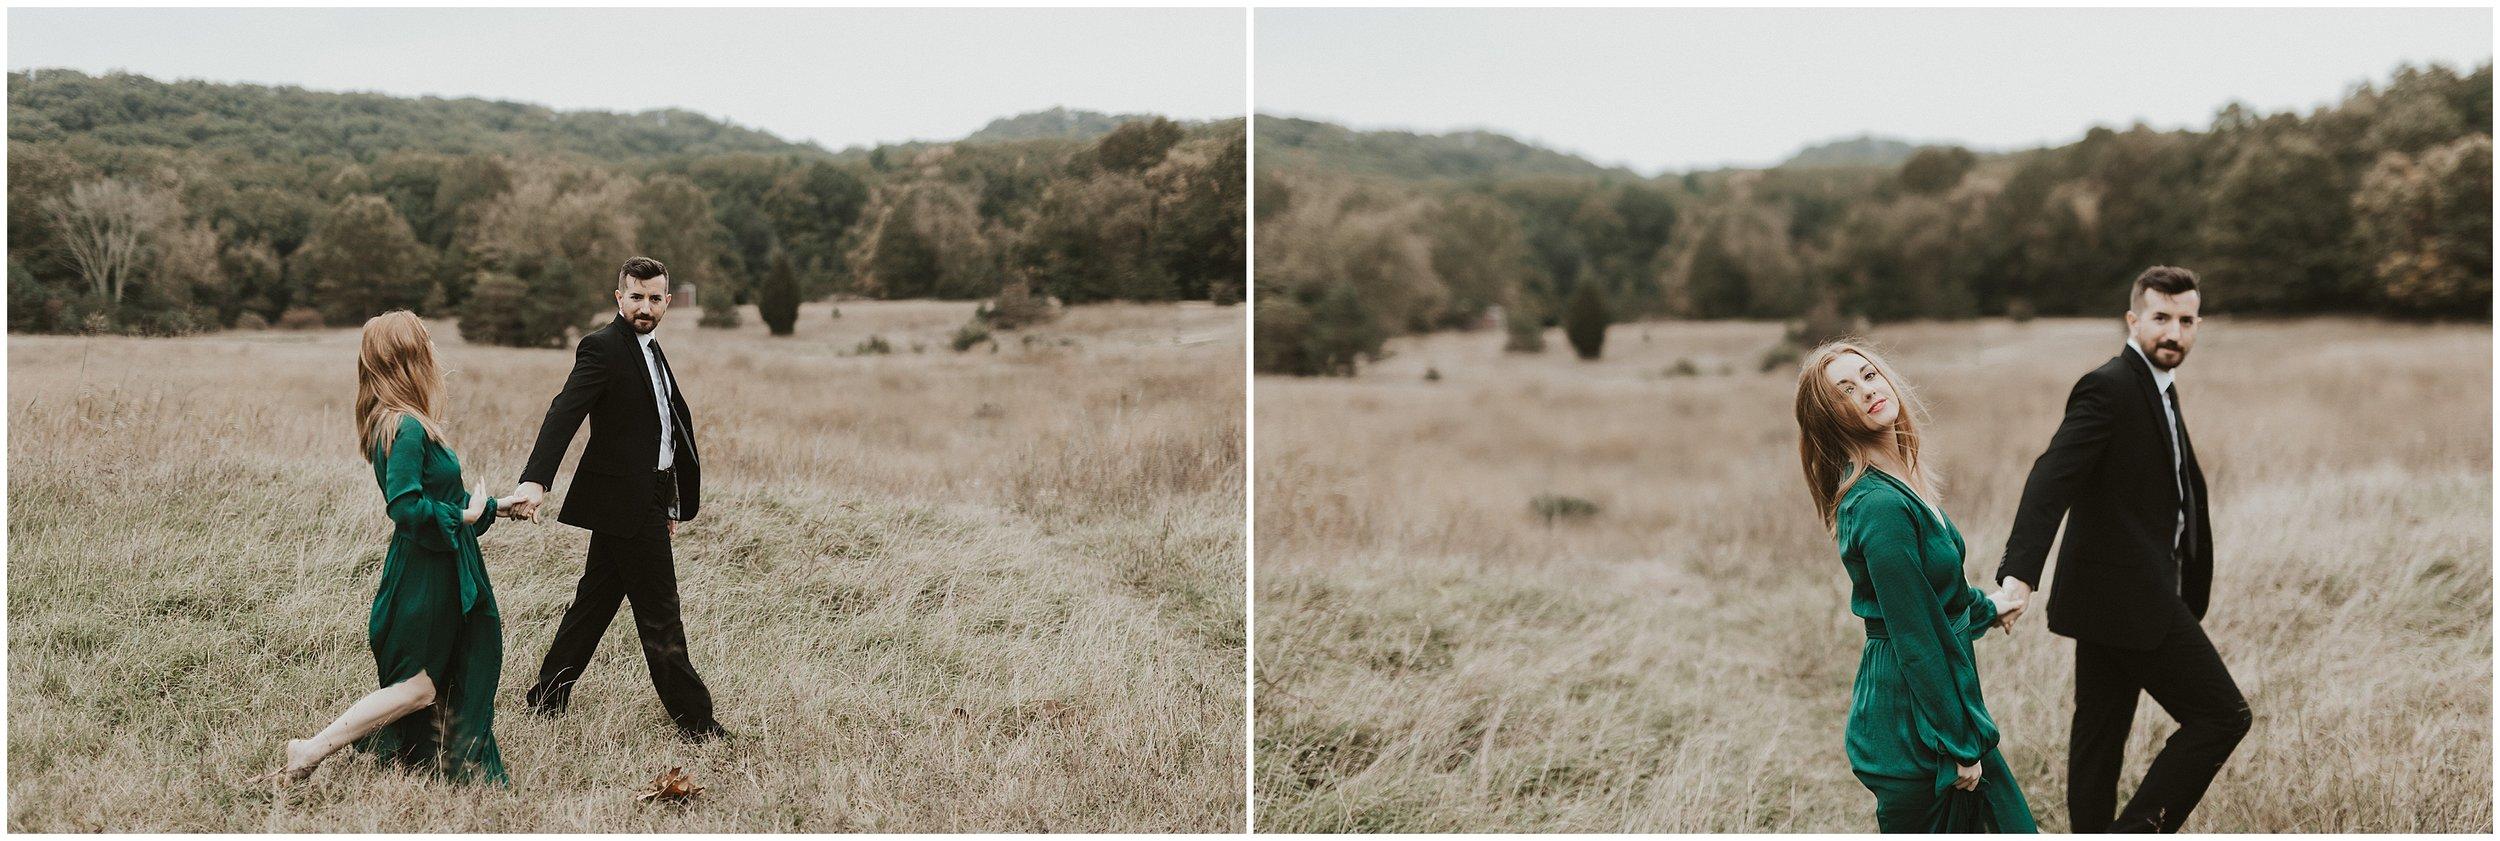 JAELYNNROSEPHOTOGRAPHY-6597.jpg